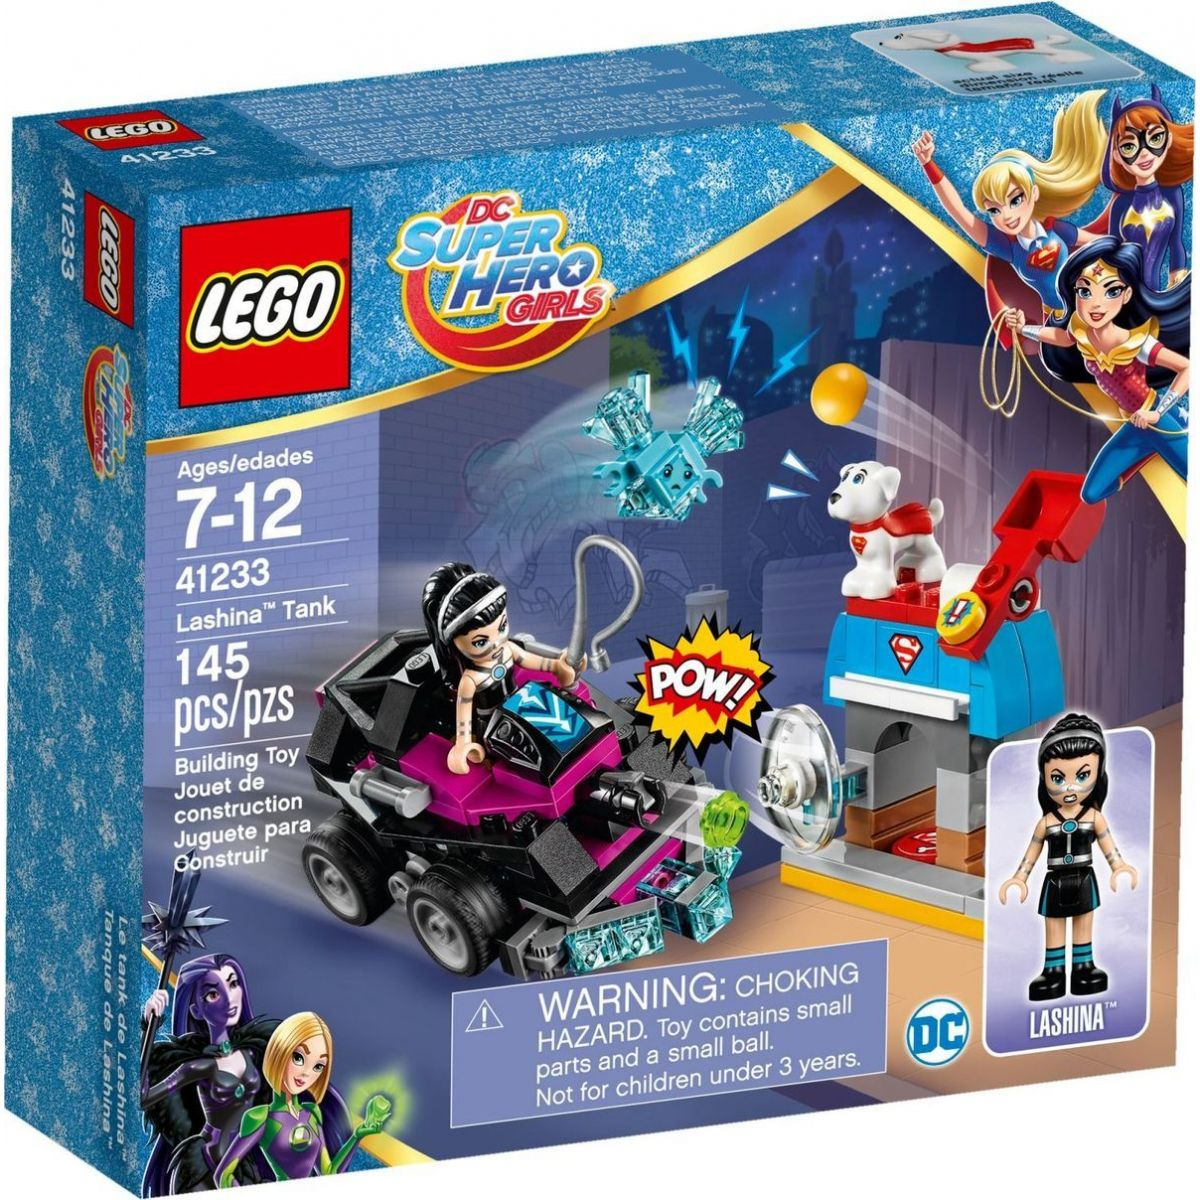 LEGO Super Heroes Girls 41233 Lashina a její vozidlo